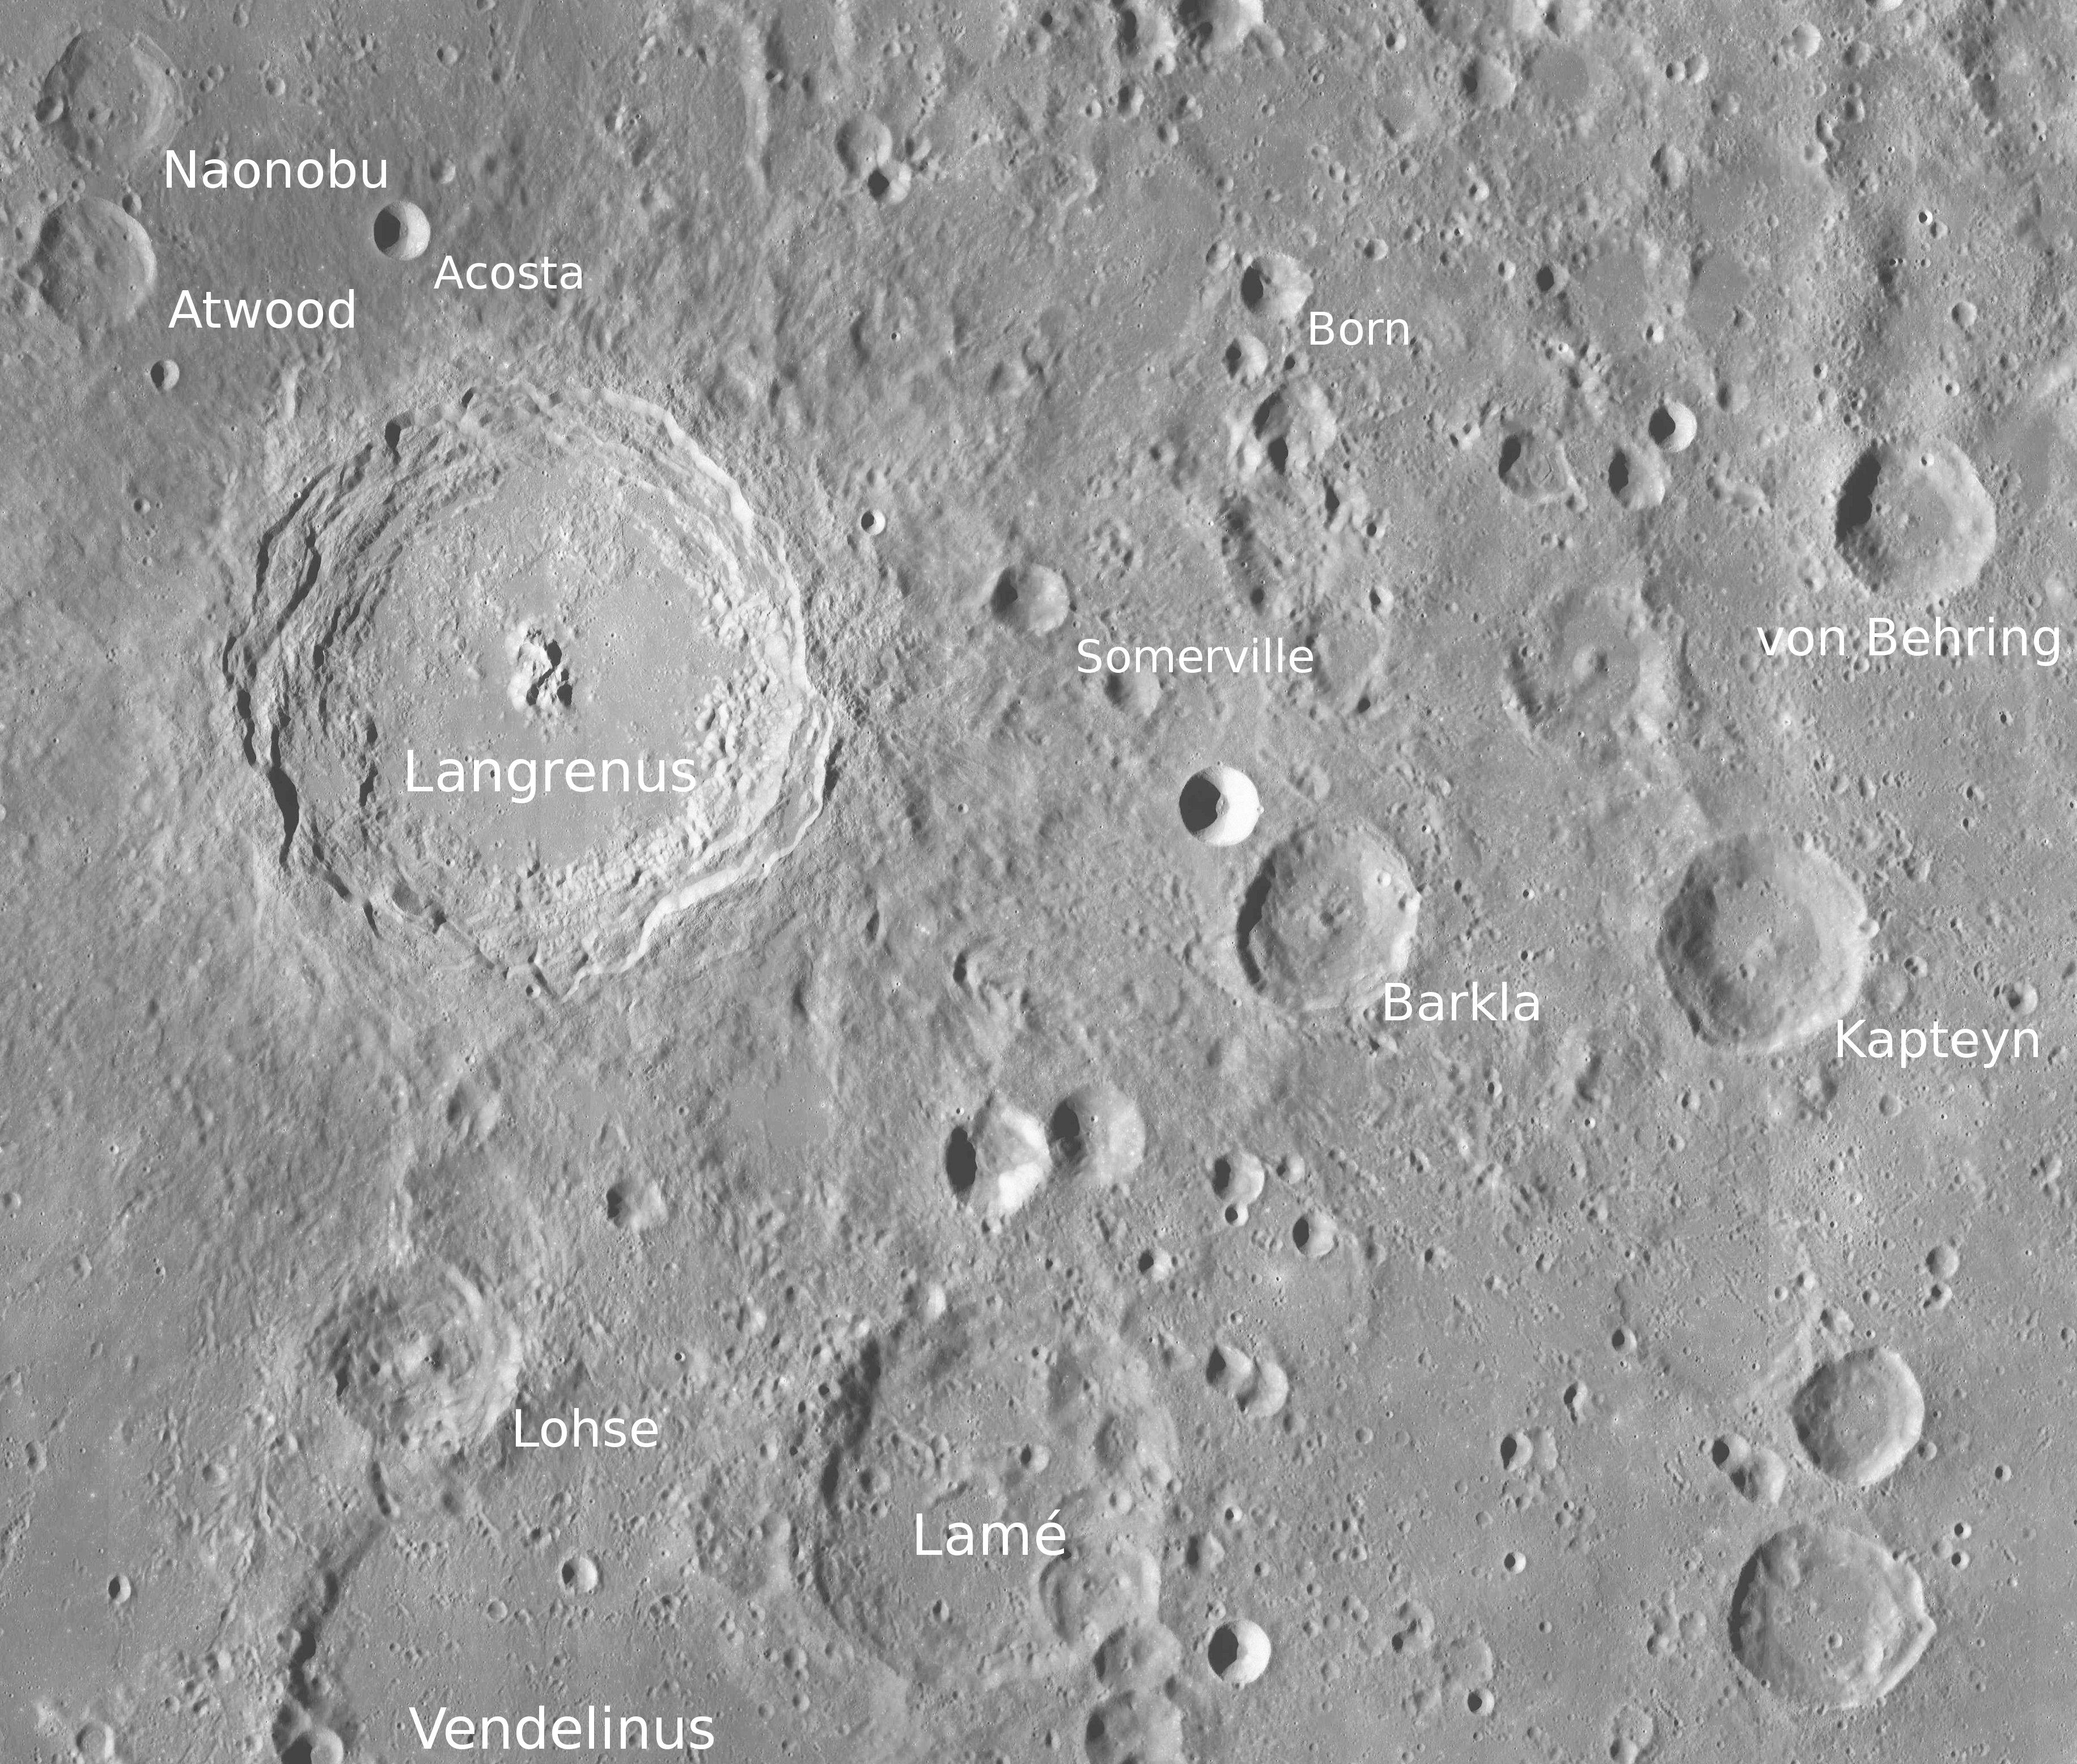 Langrenus - LROC - WAC.JPG